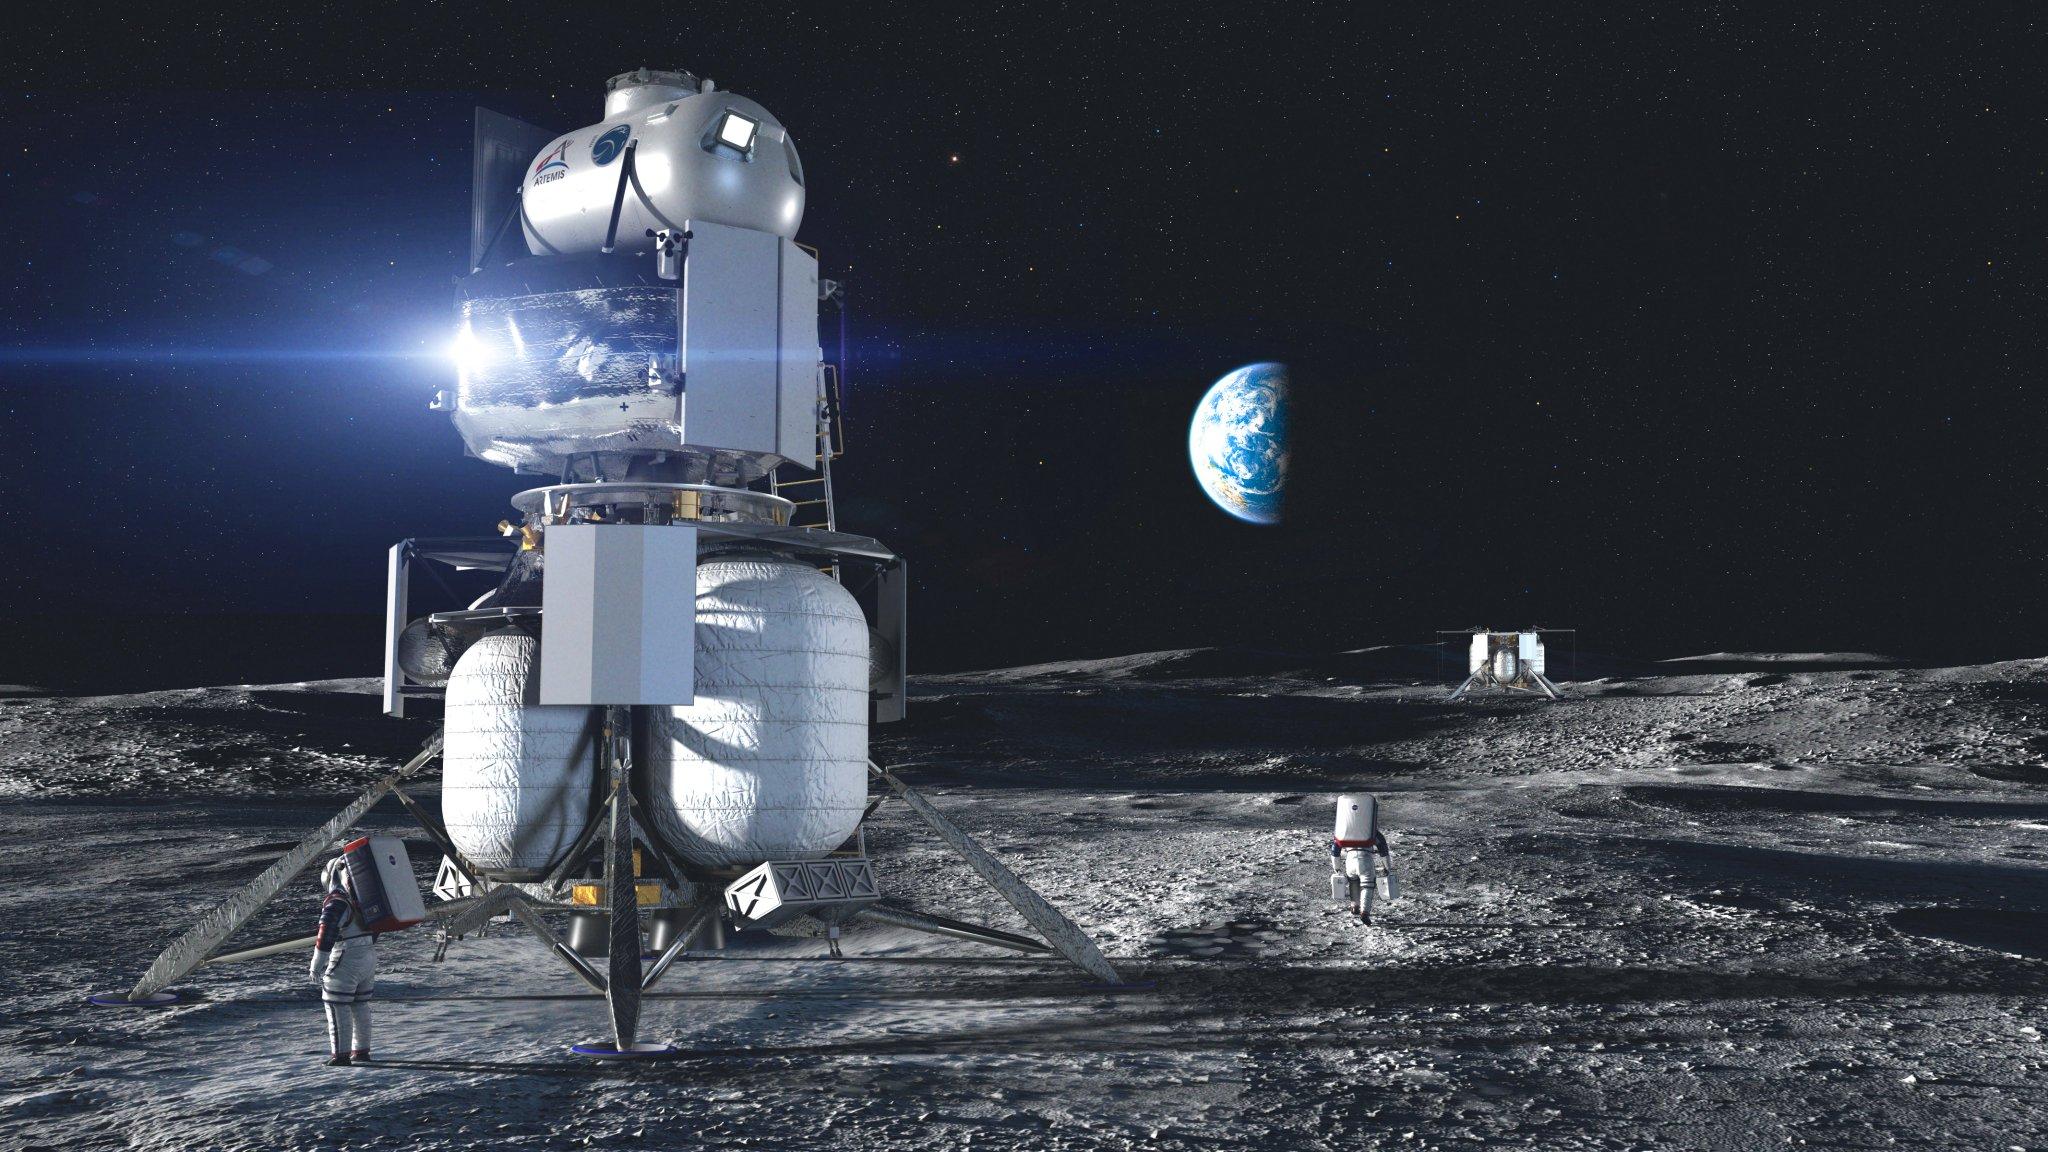 NASA picks Alabama's Dynetics for Moon lander prototype